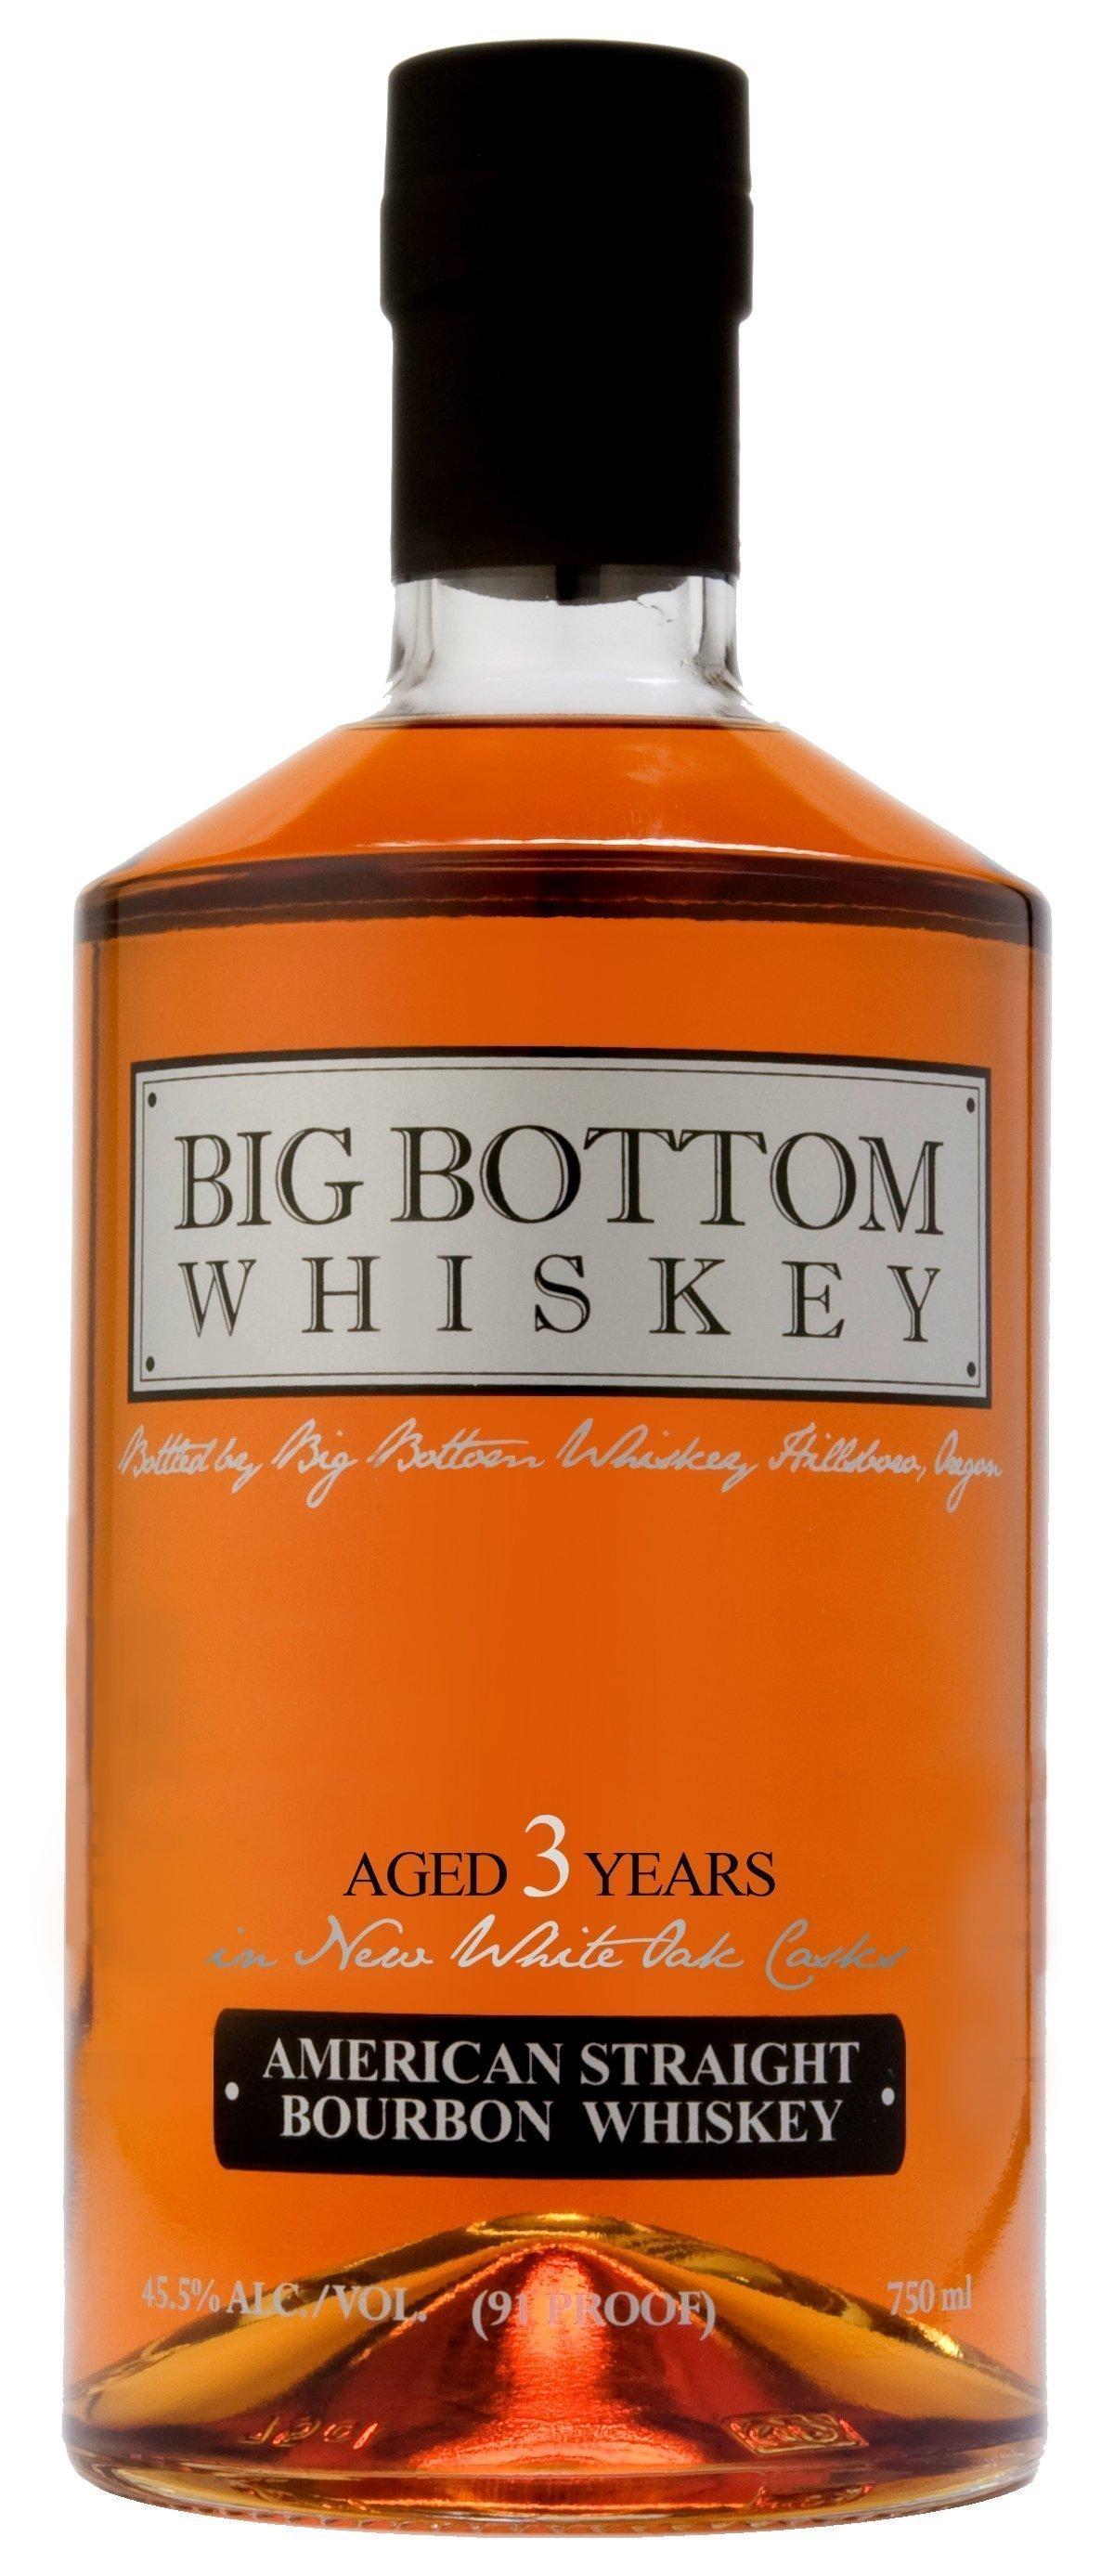 Big Bottom Bourbon 3 Years Old New White Oak